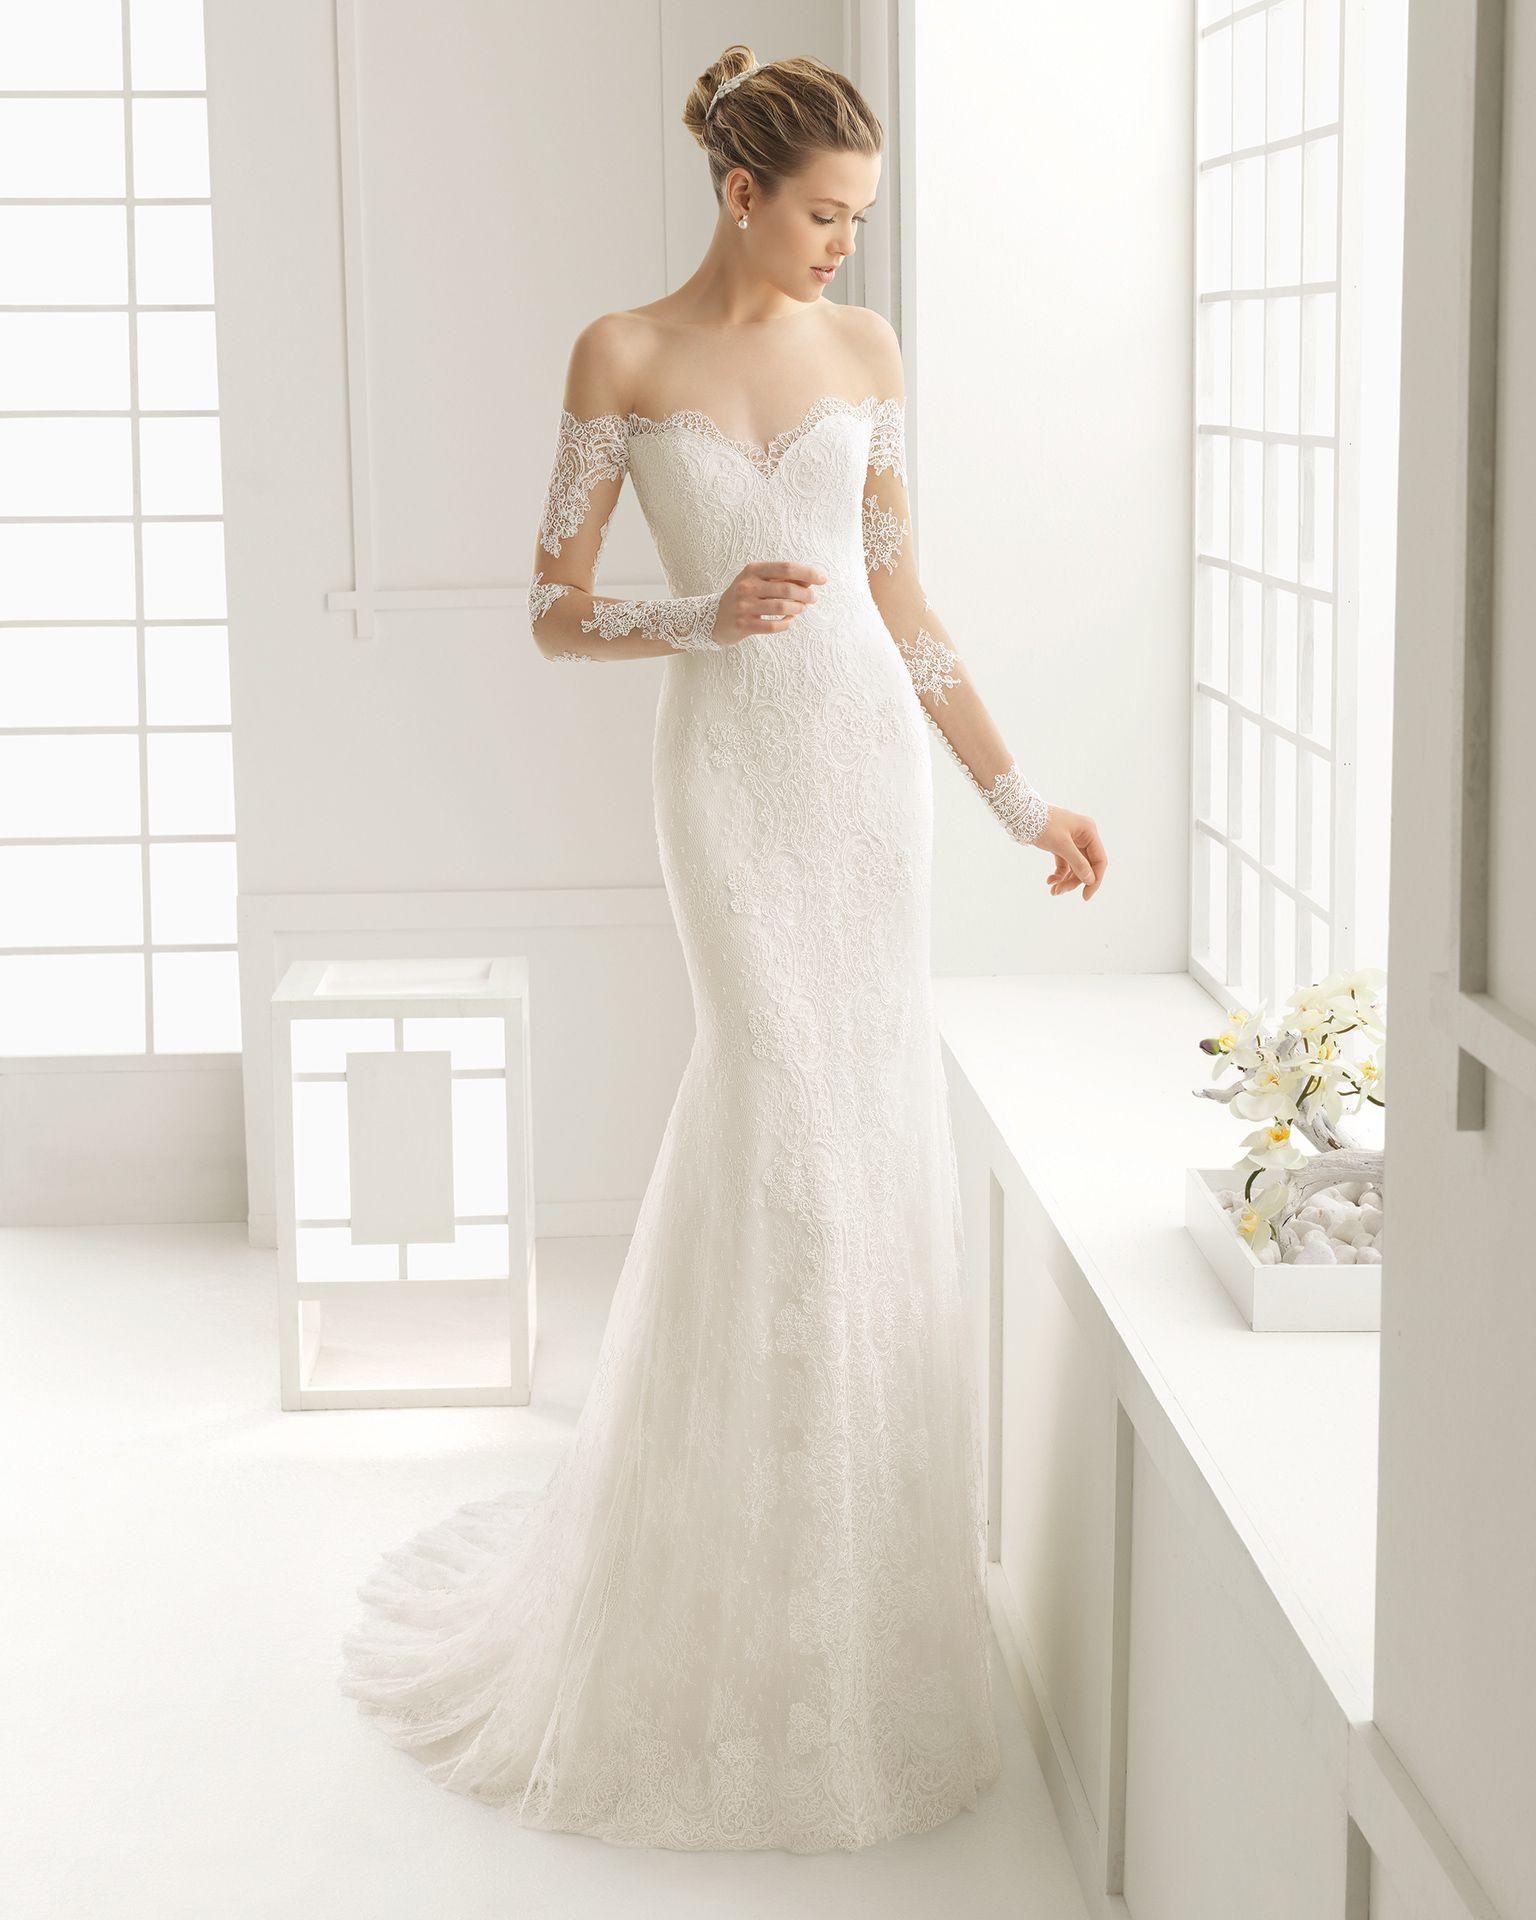 Dore - Collection Rosa Clará 2016 de robes de mariée